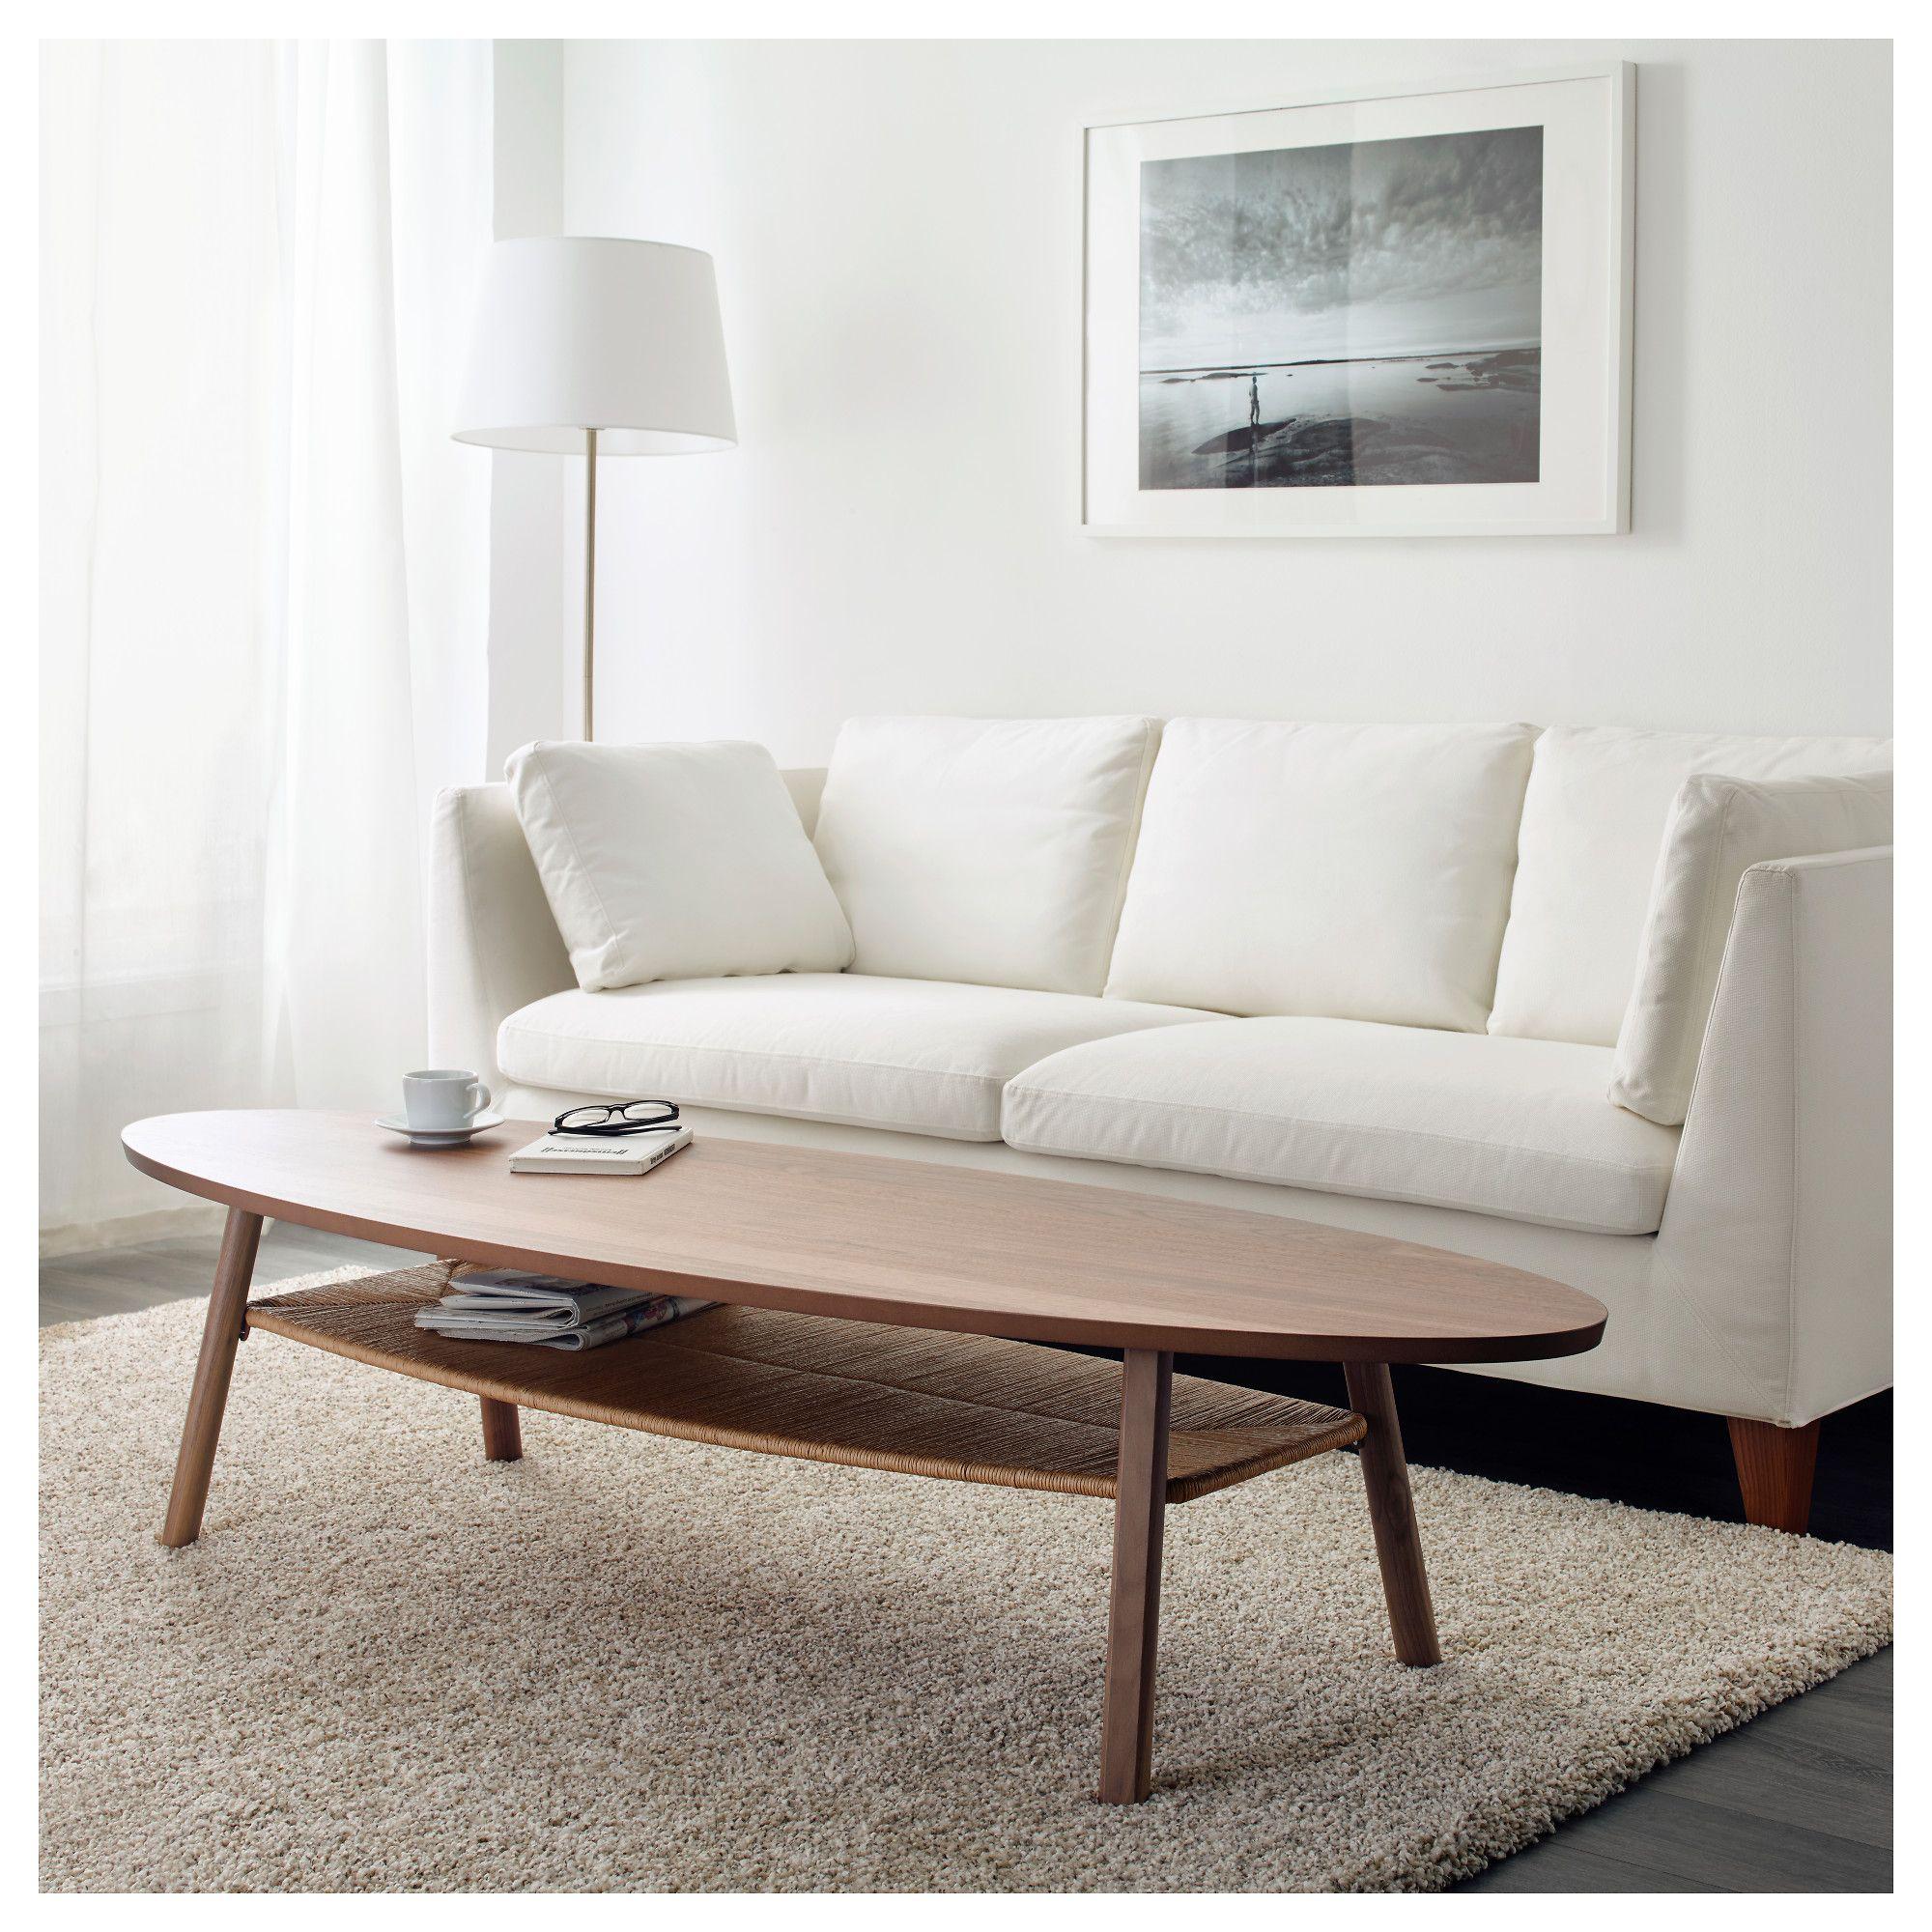 STOCKHOLM Coffee table walnut veneer 70 7/8x23 1/4